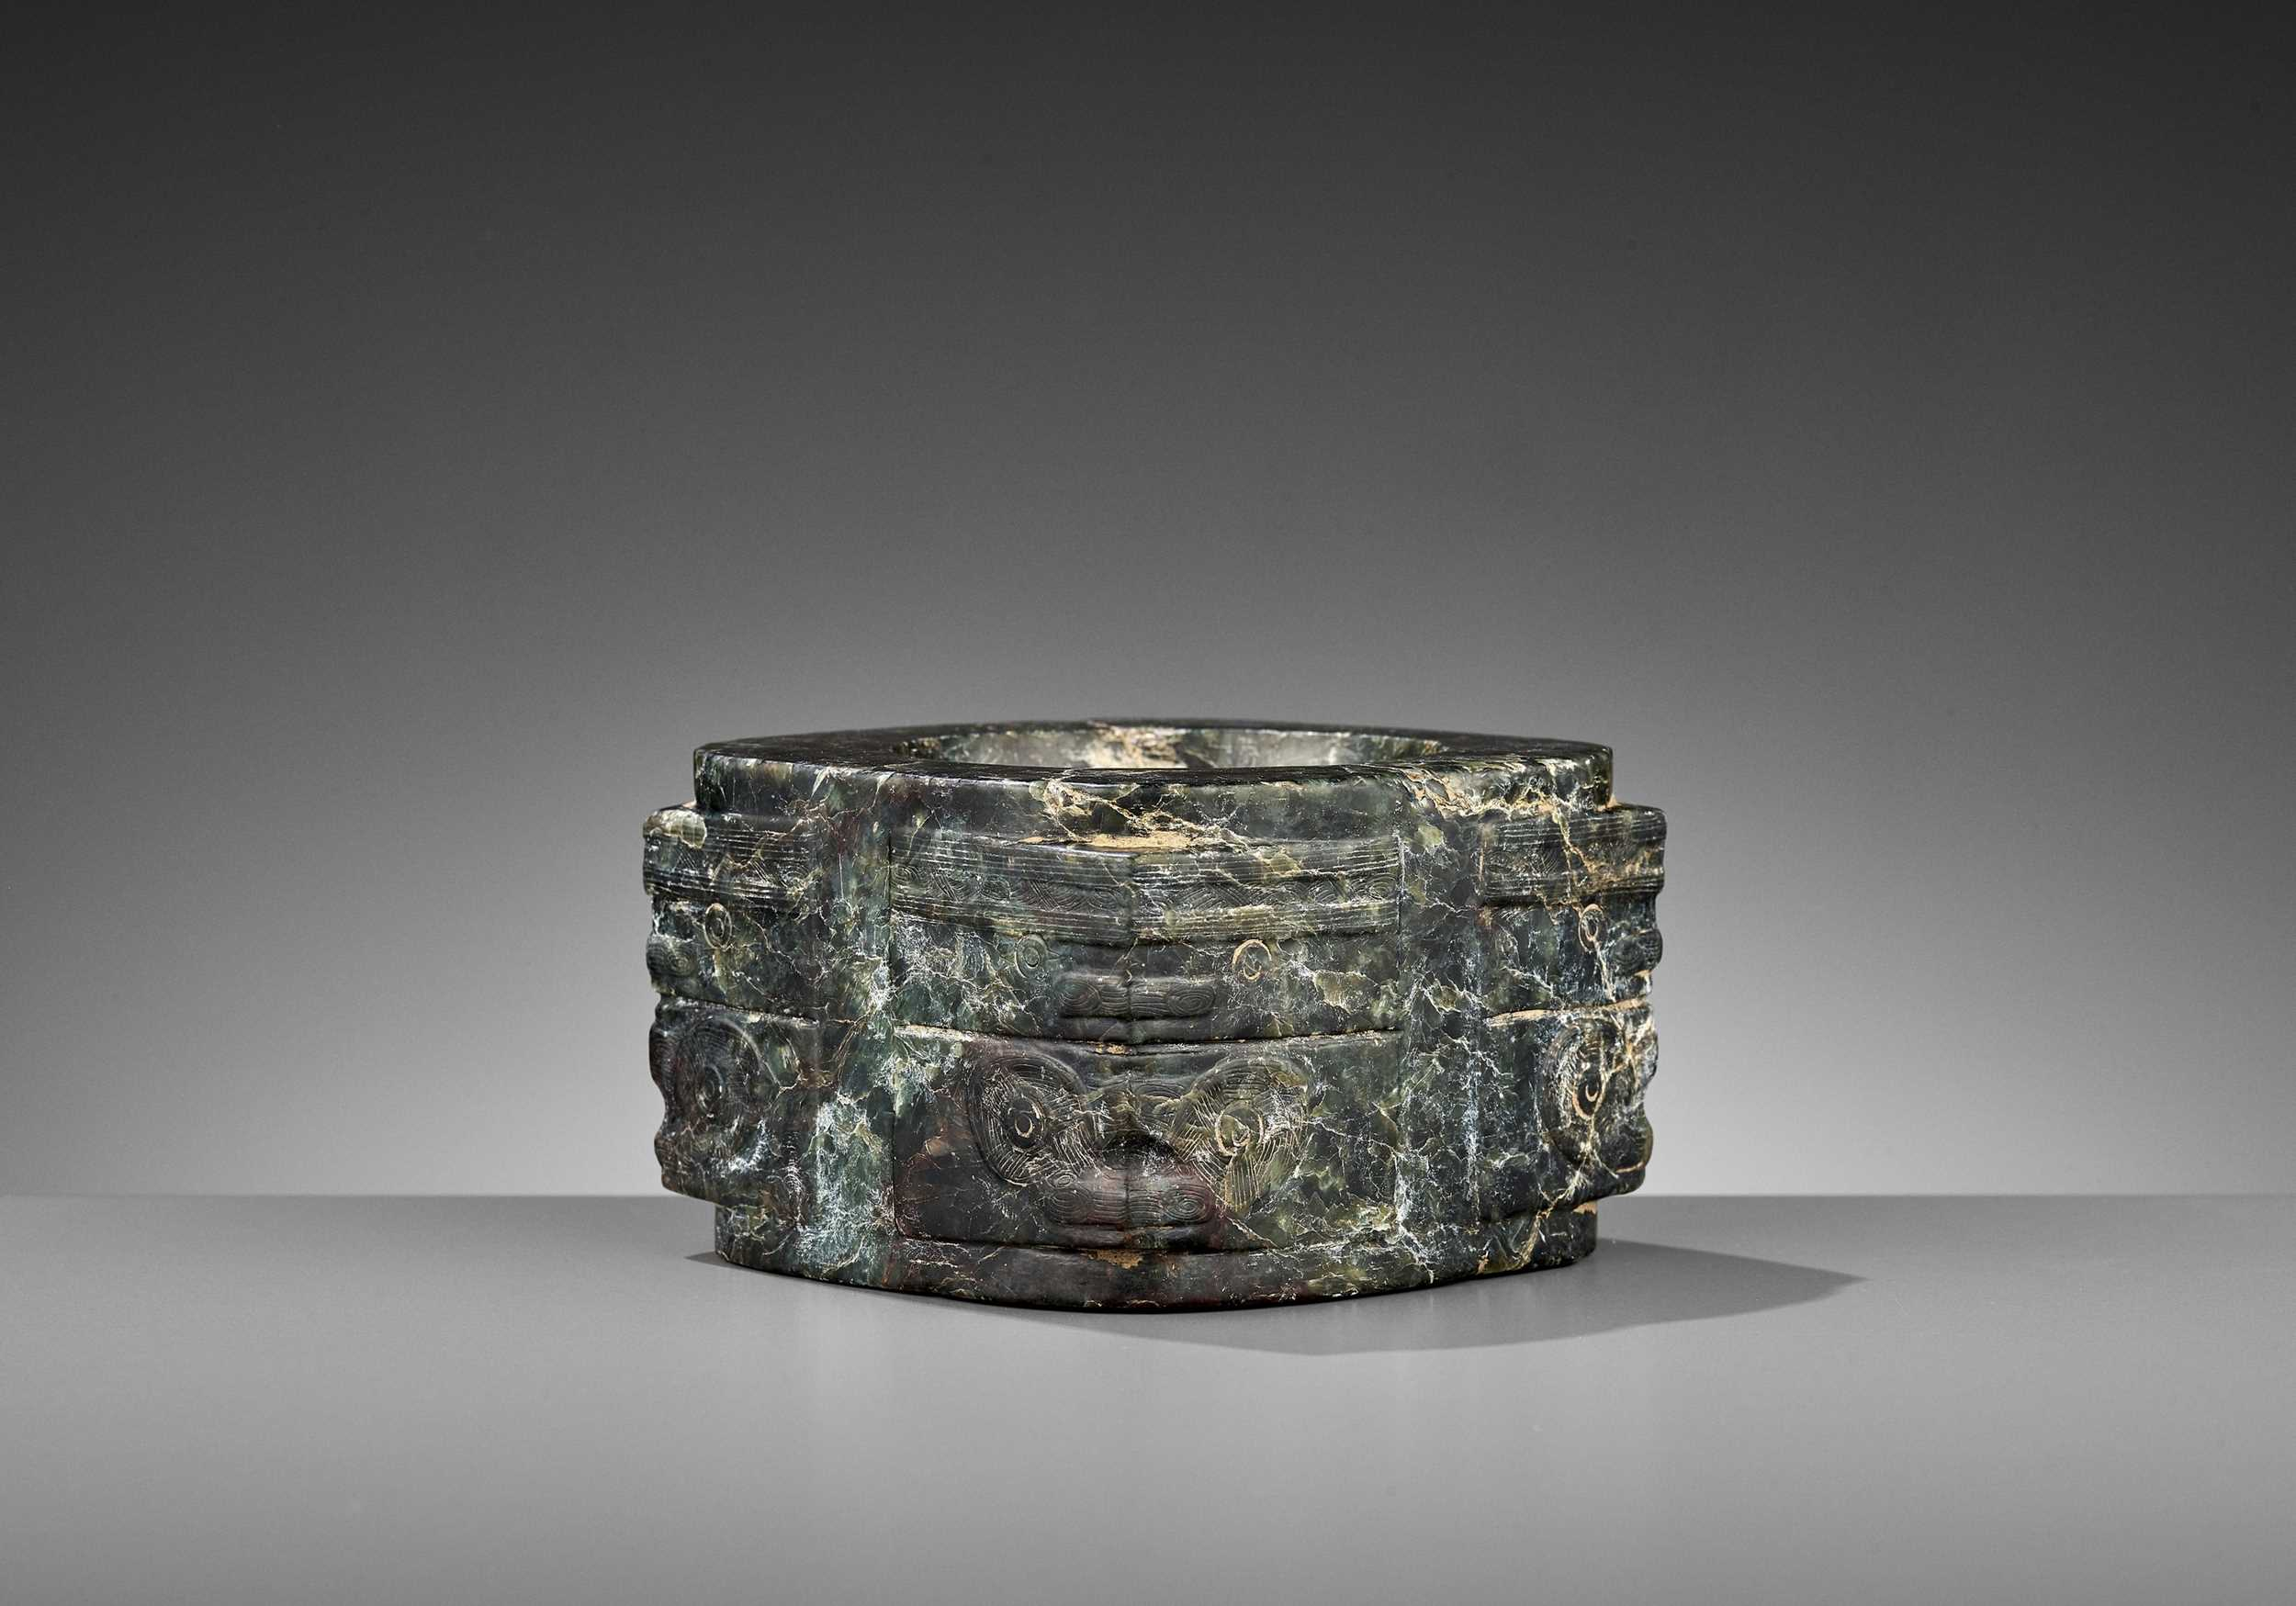 Lot 50 - A MOTTLED GREEN JADE CONG, LIANGZHU CULTURE